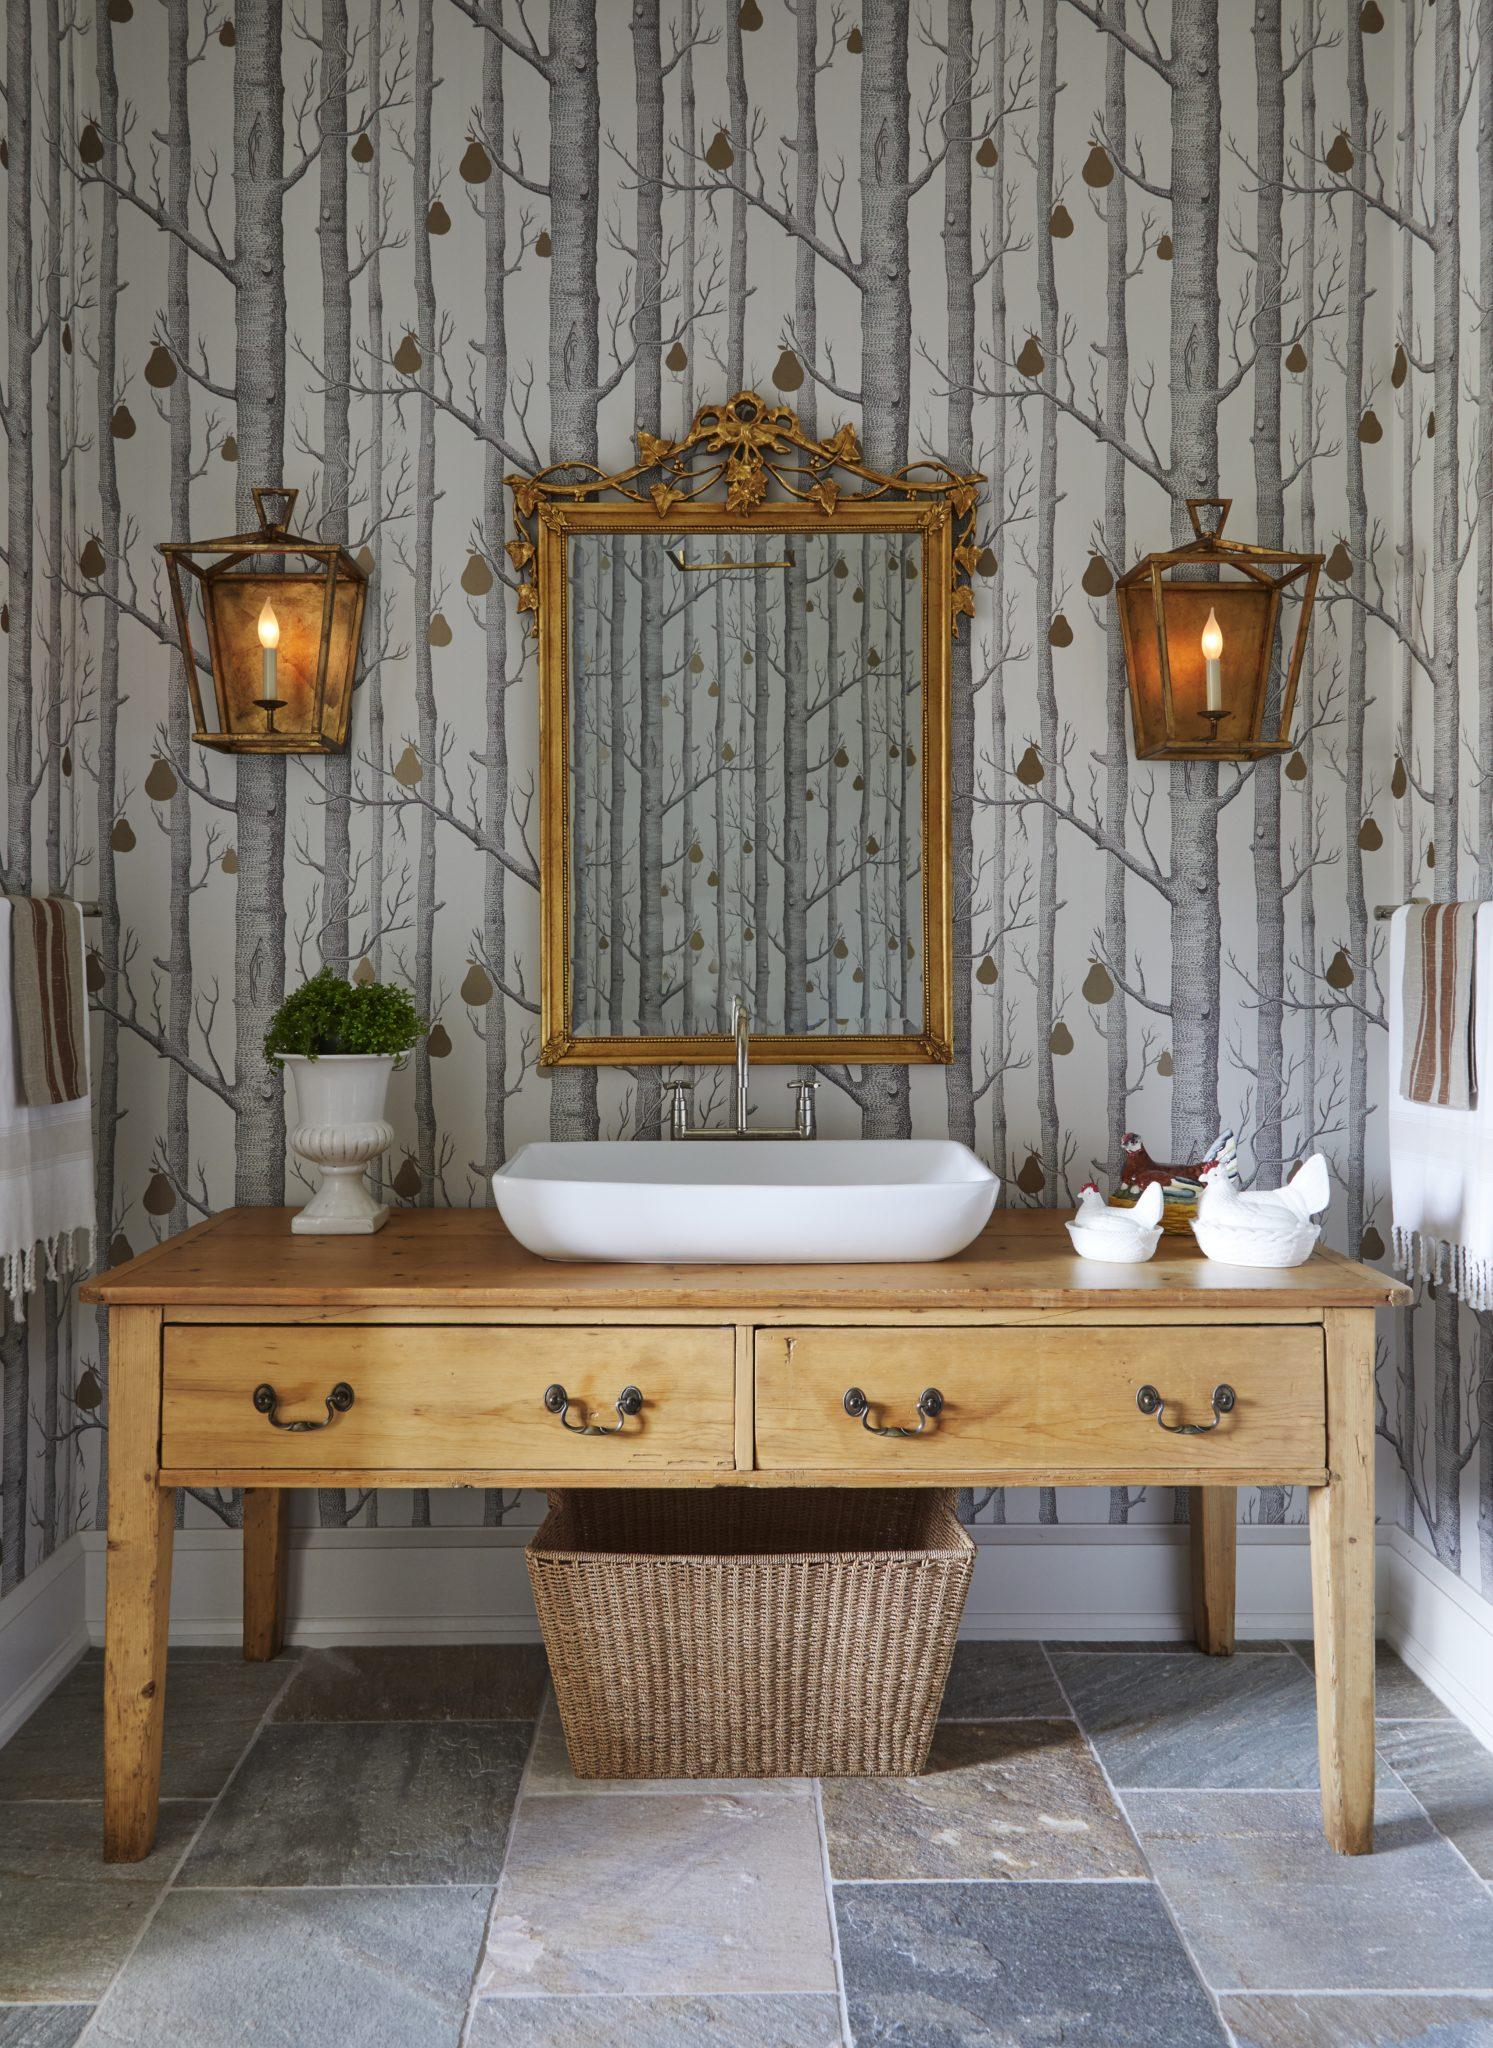 Rustic chic bathroom with tree printed wallpaper, lantern sconces, wooden vanity by Elizabeth Drake